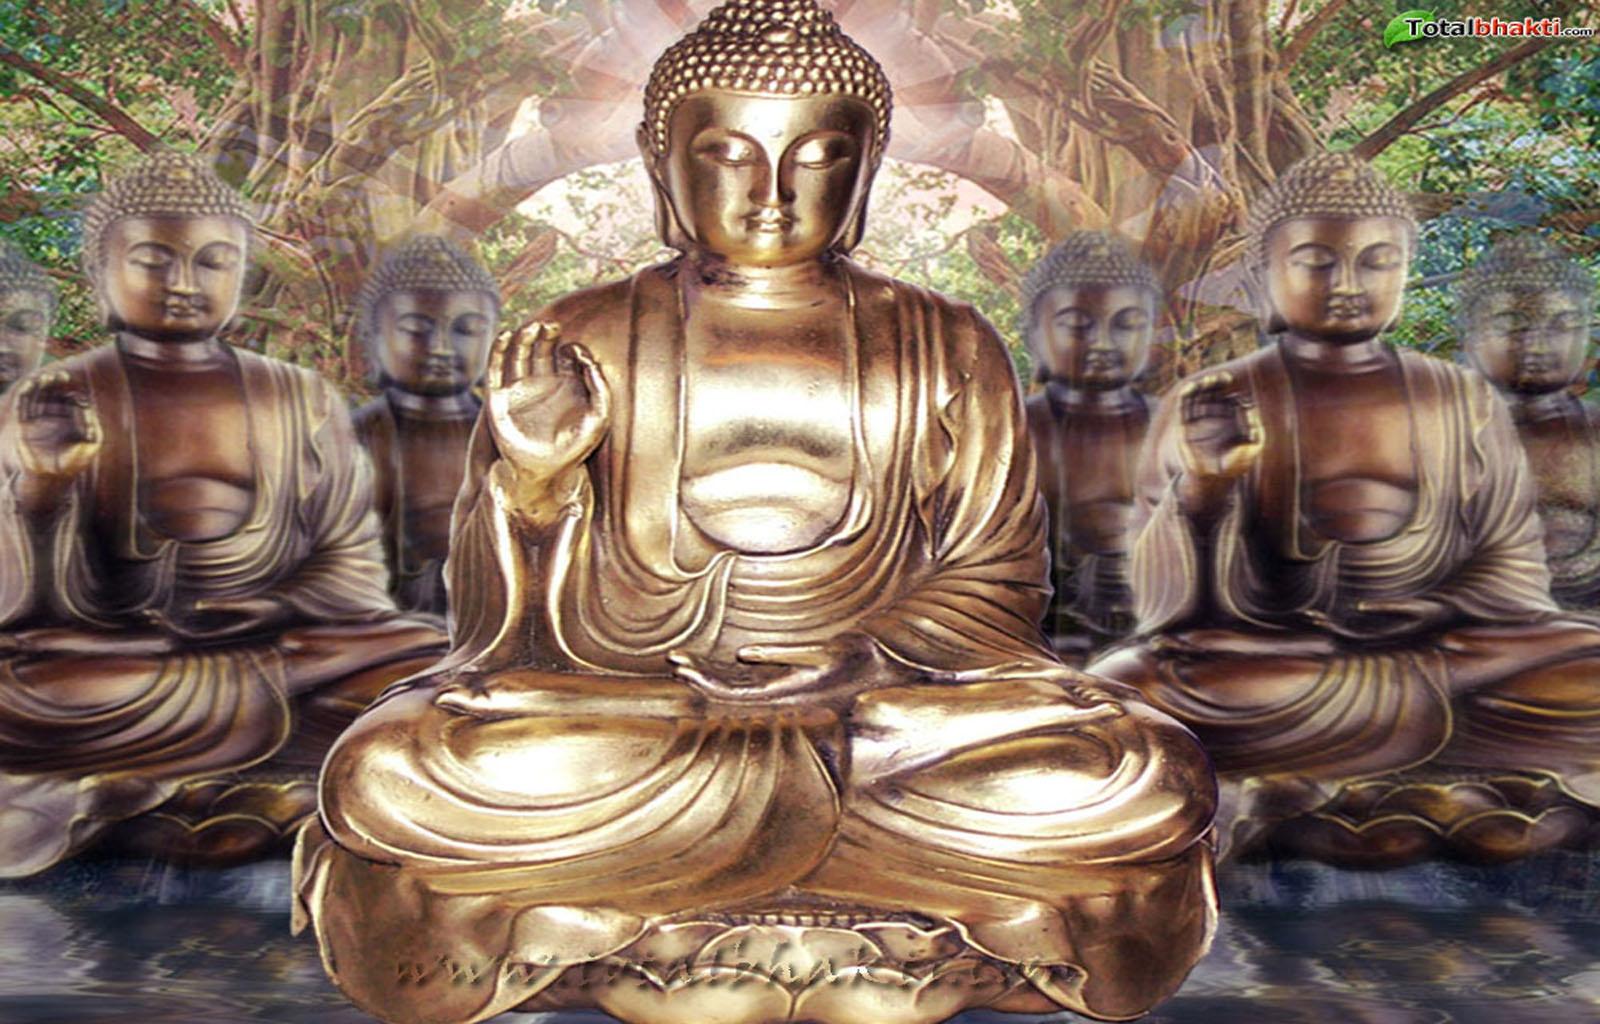 Buddha wallpapers for desktop wallpapersafari - Wallpaper 1600x1024 ...